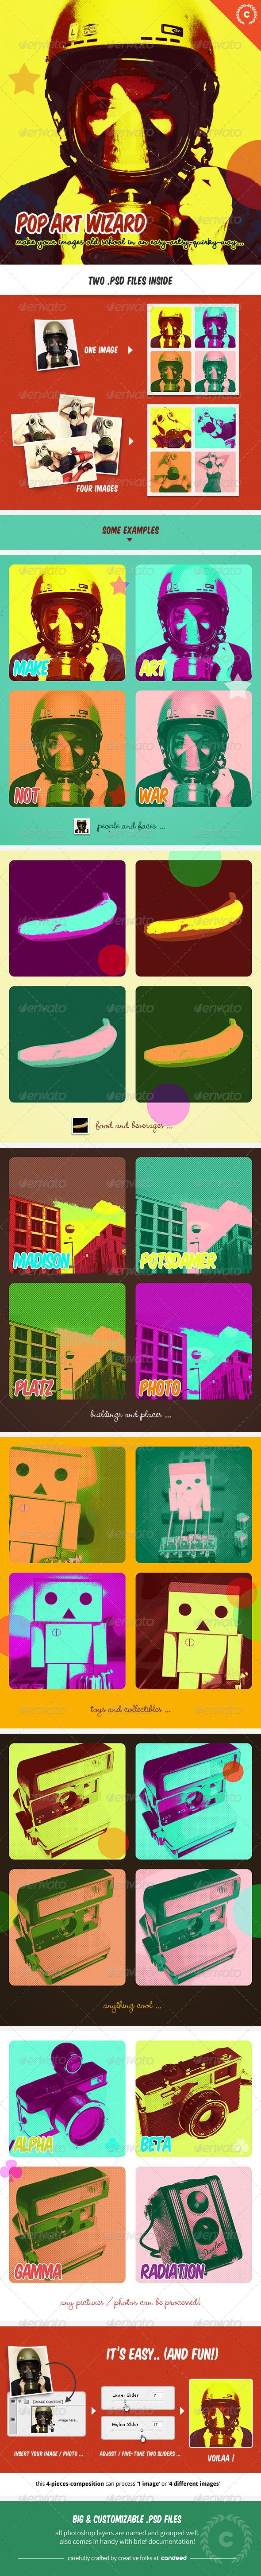 GraphicRiver Pop Art Wizard Stencils Pictures Maker 4798980